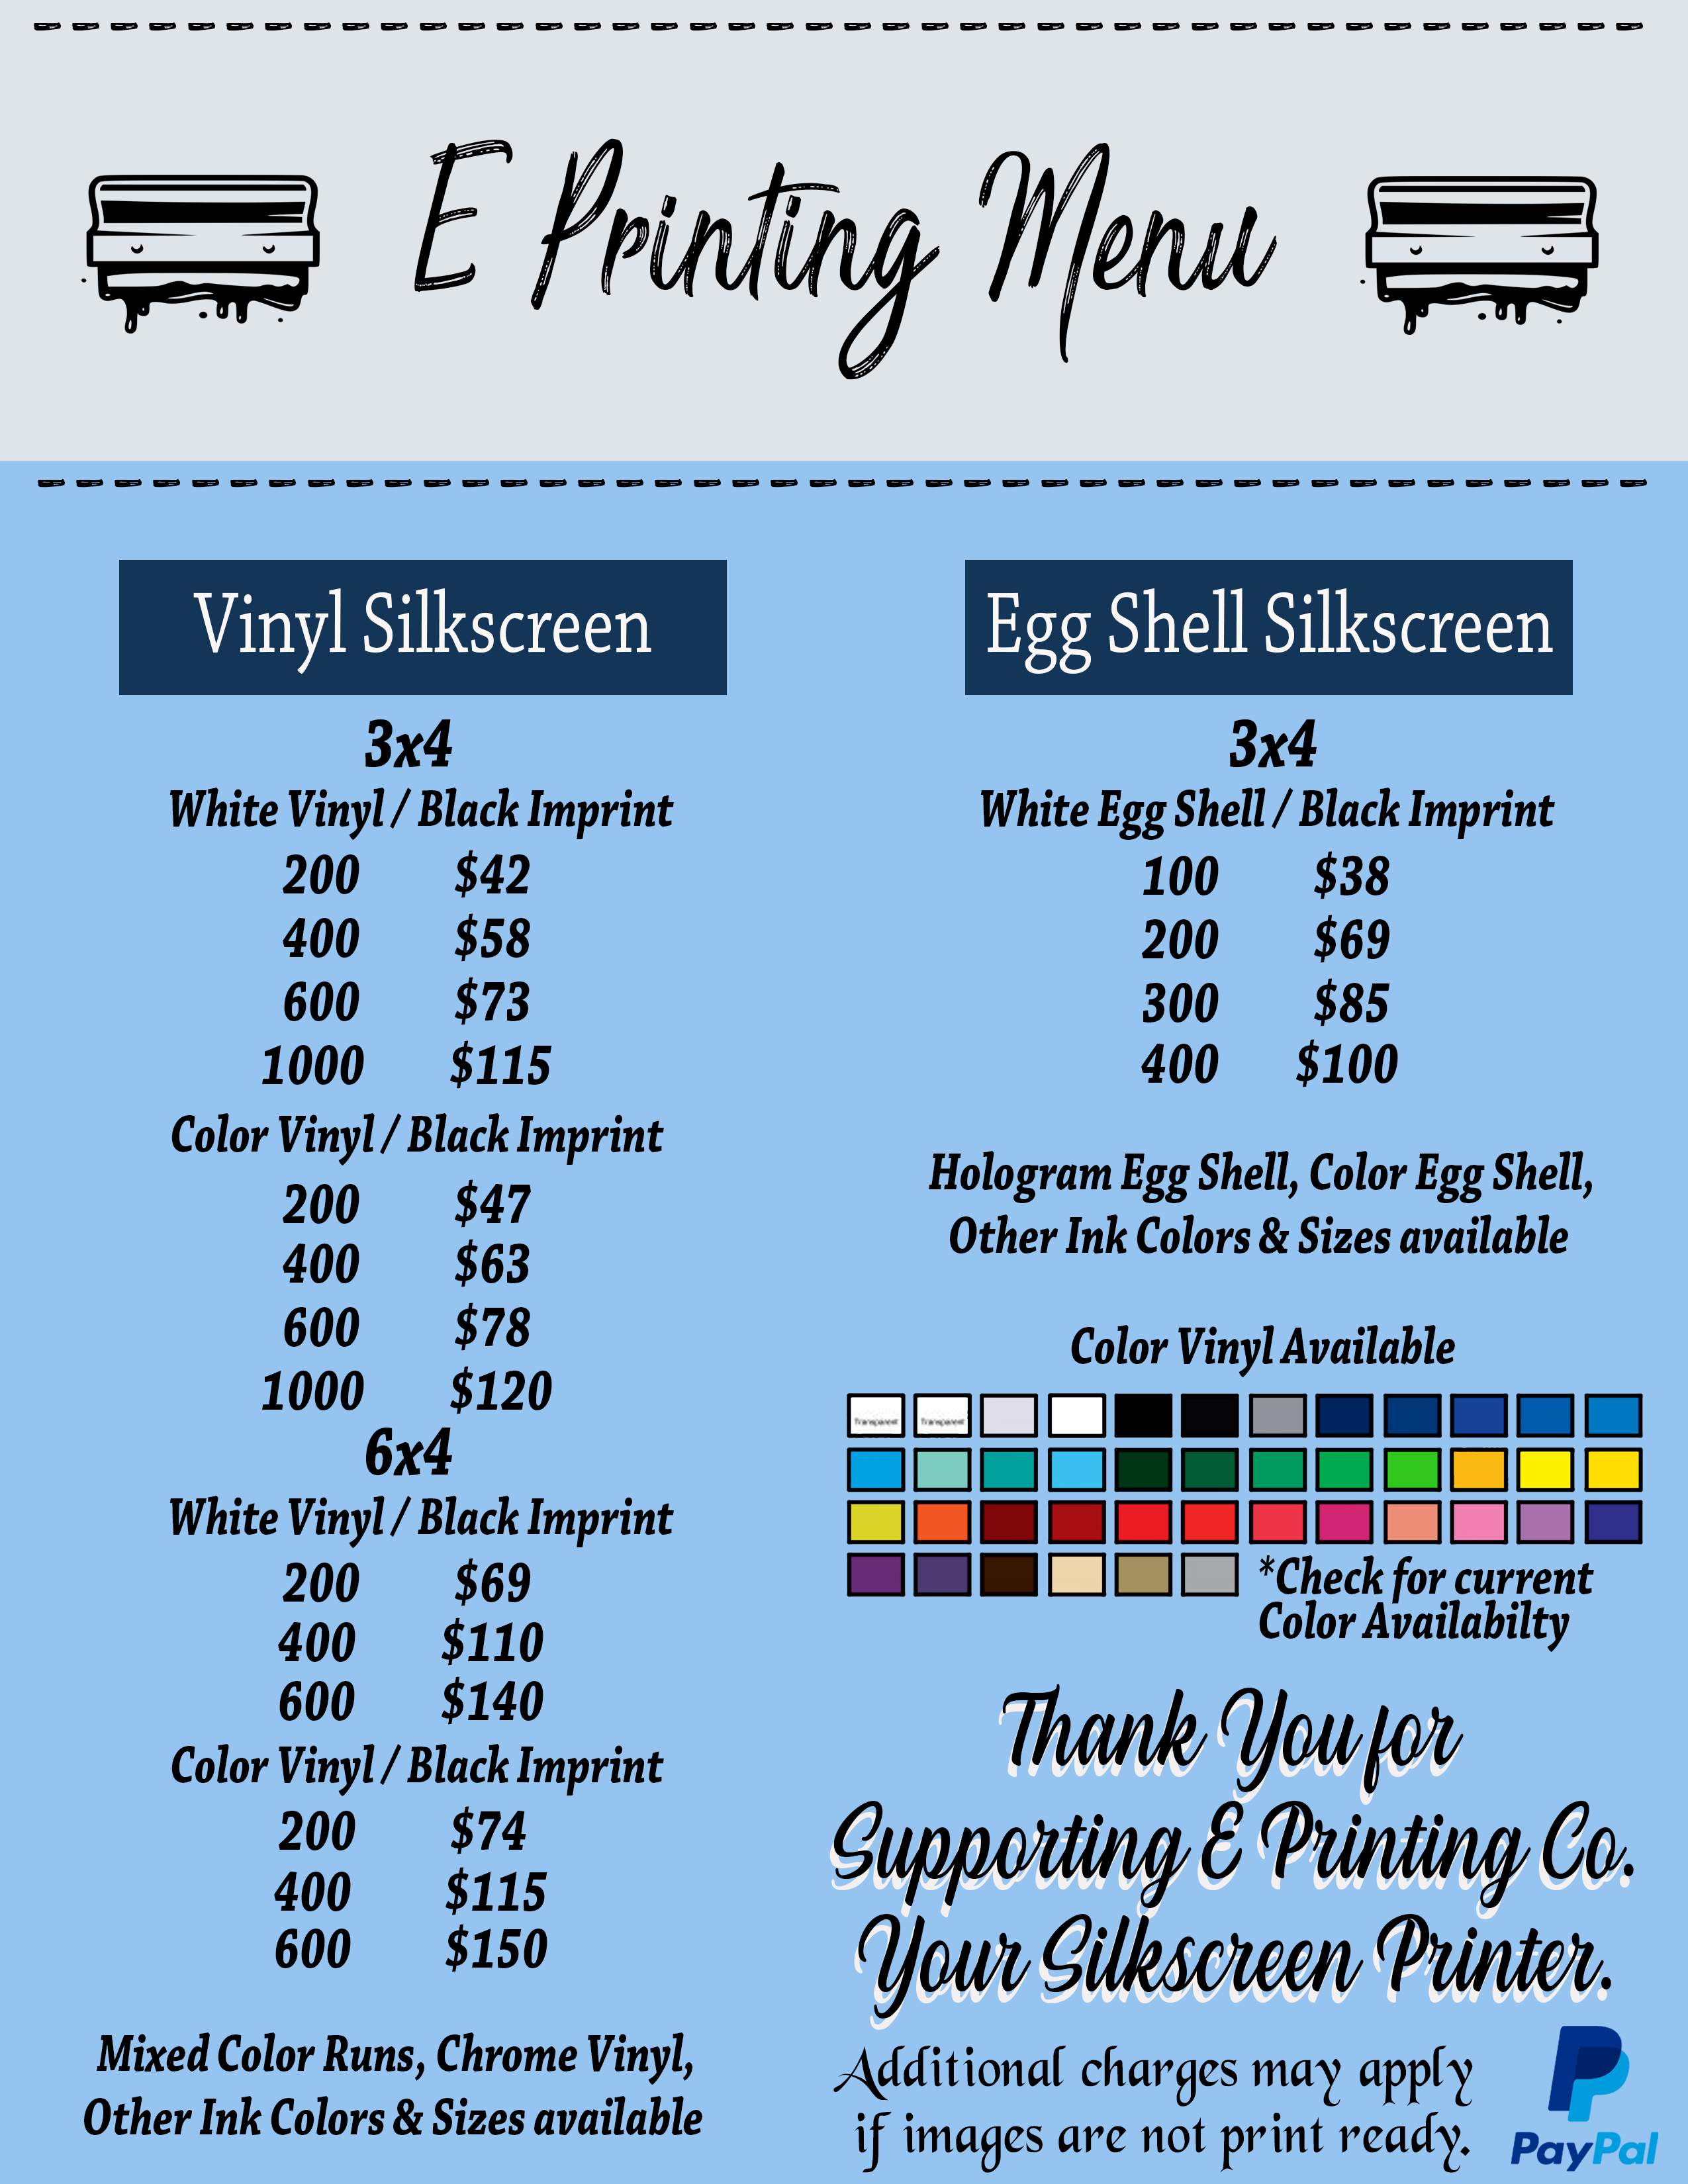 E Printing image